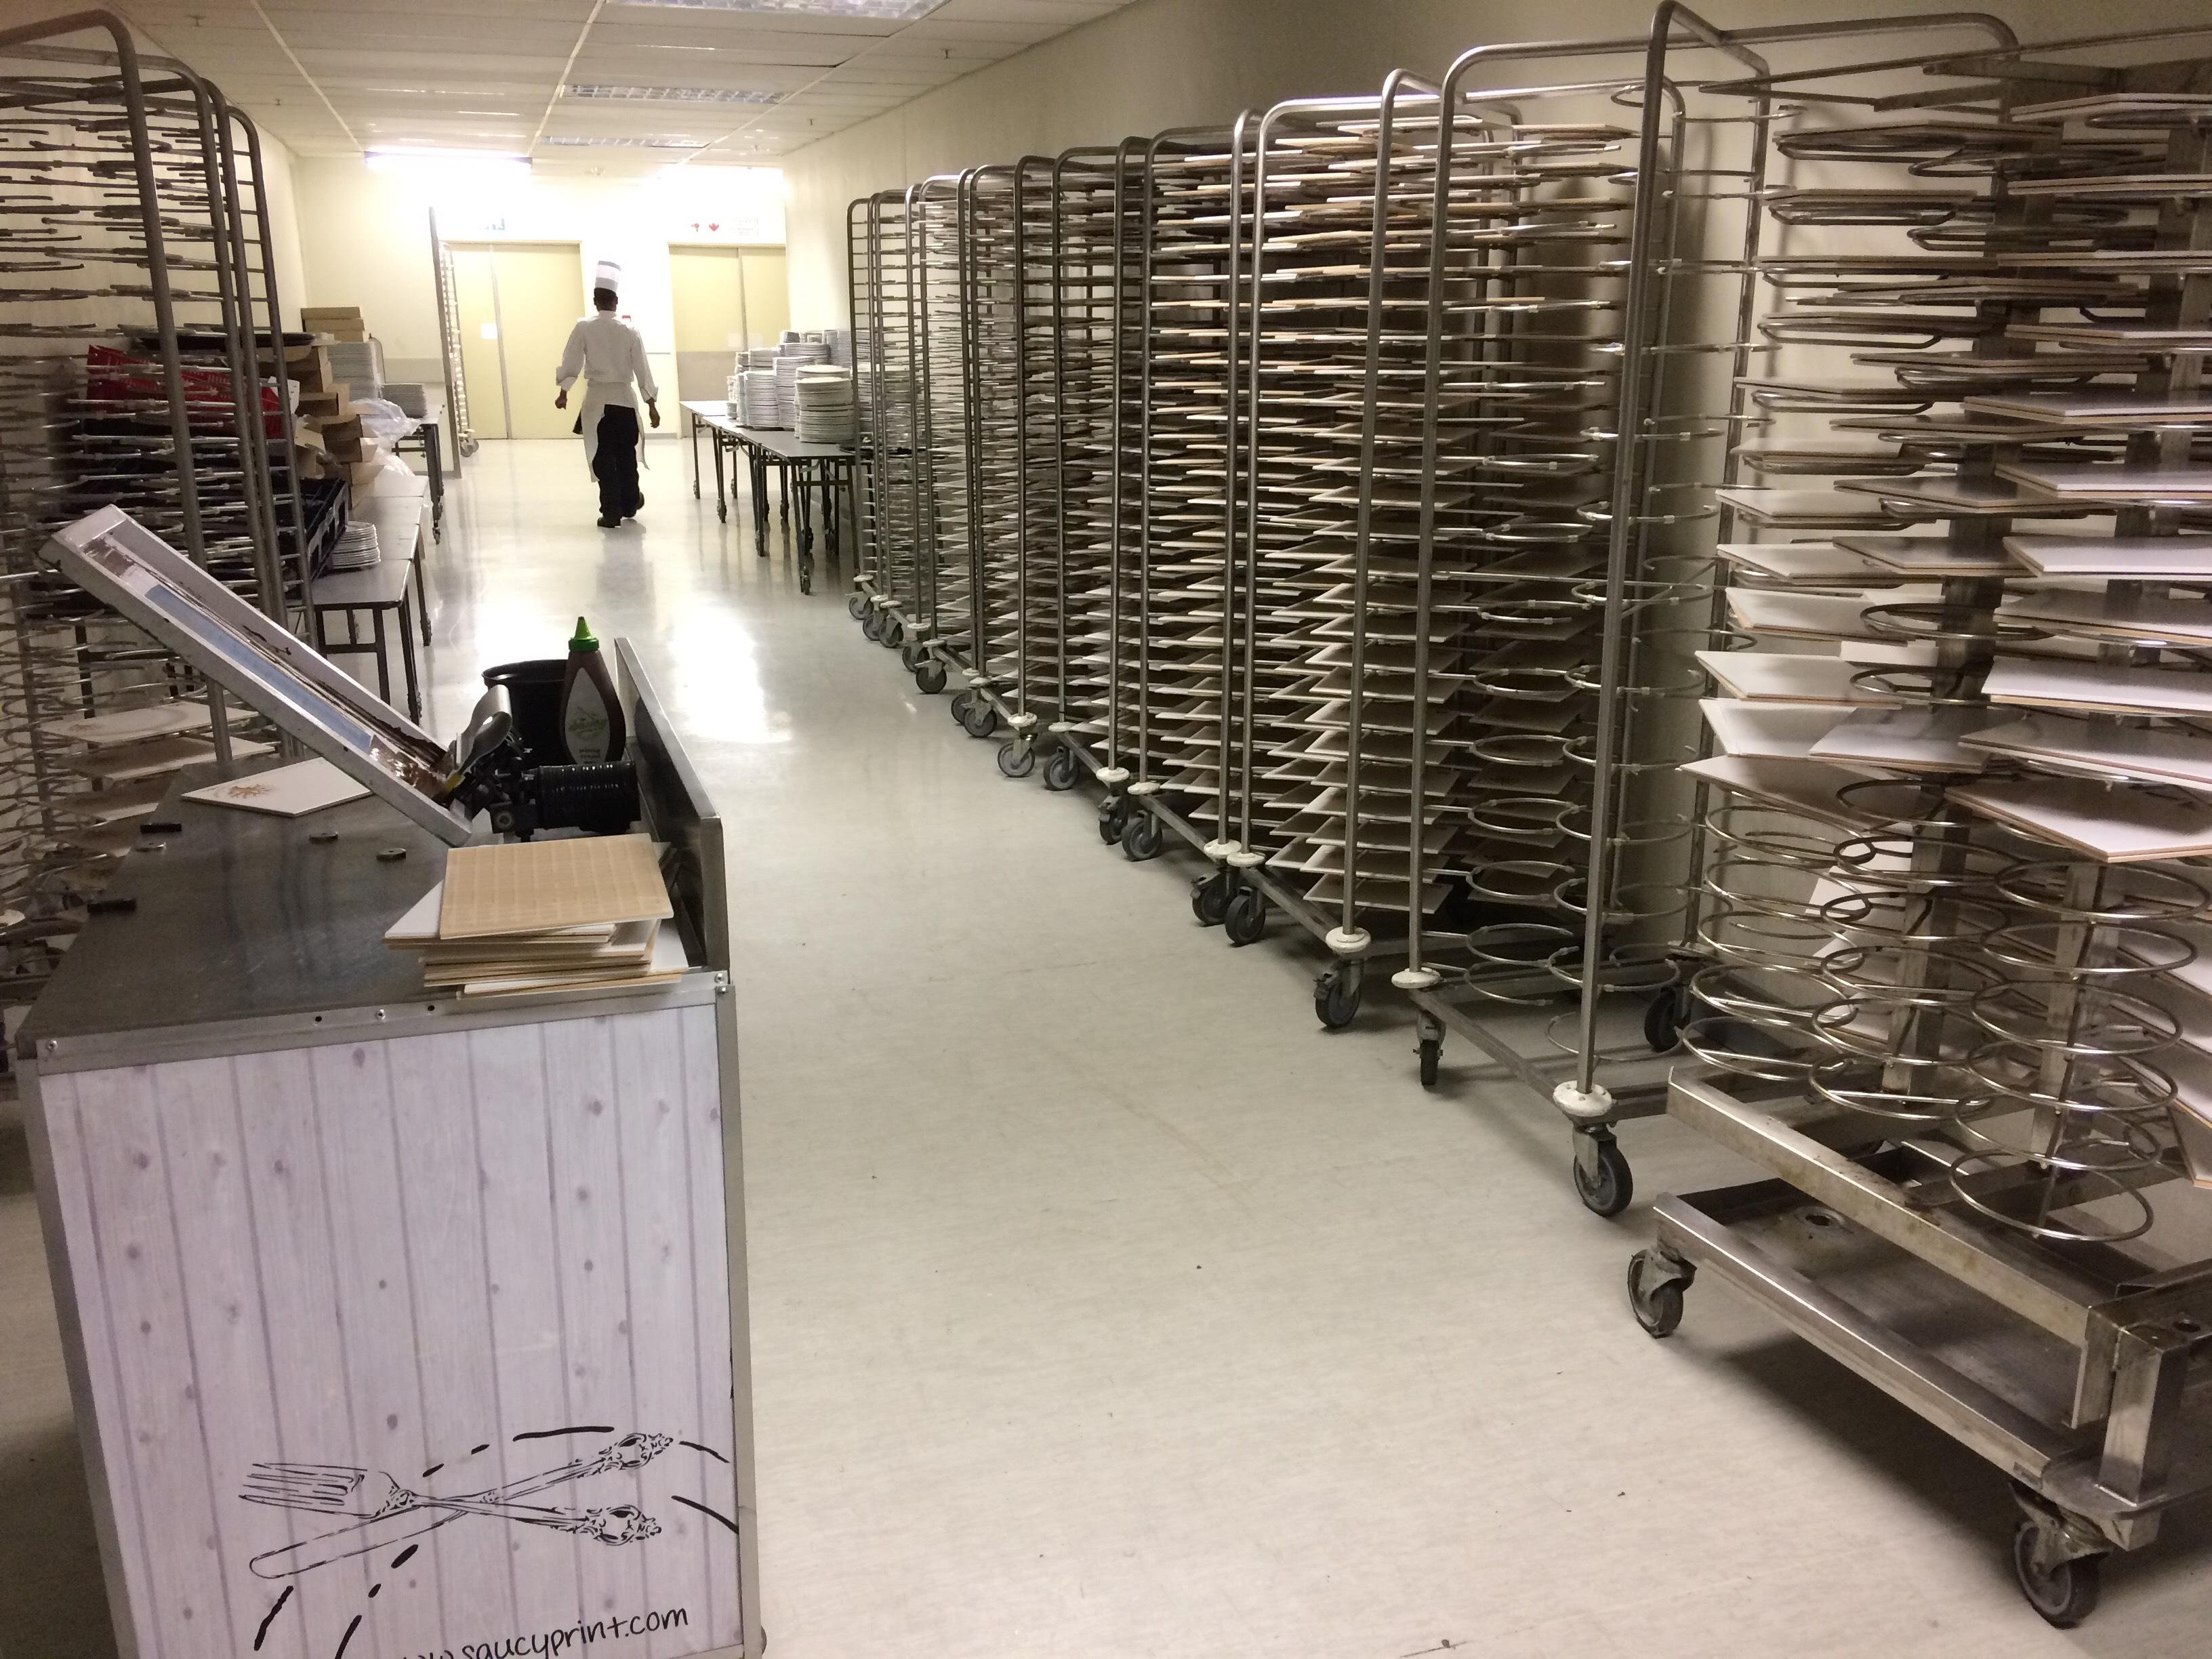 1000 printed plates